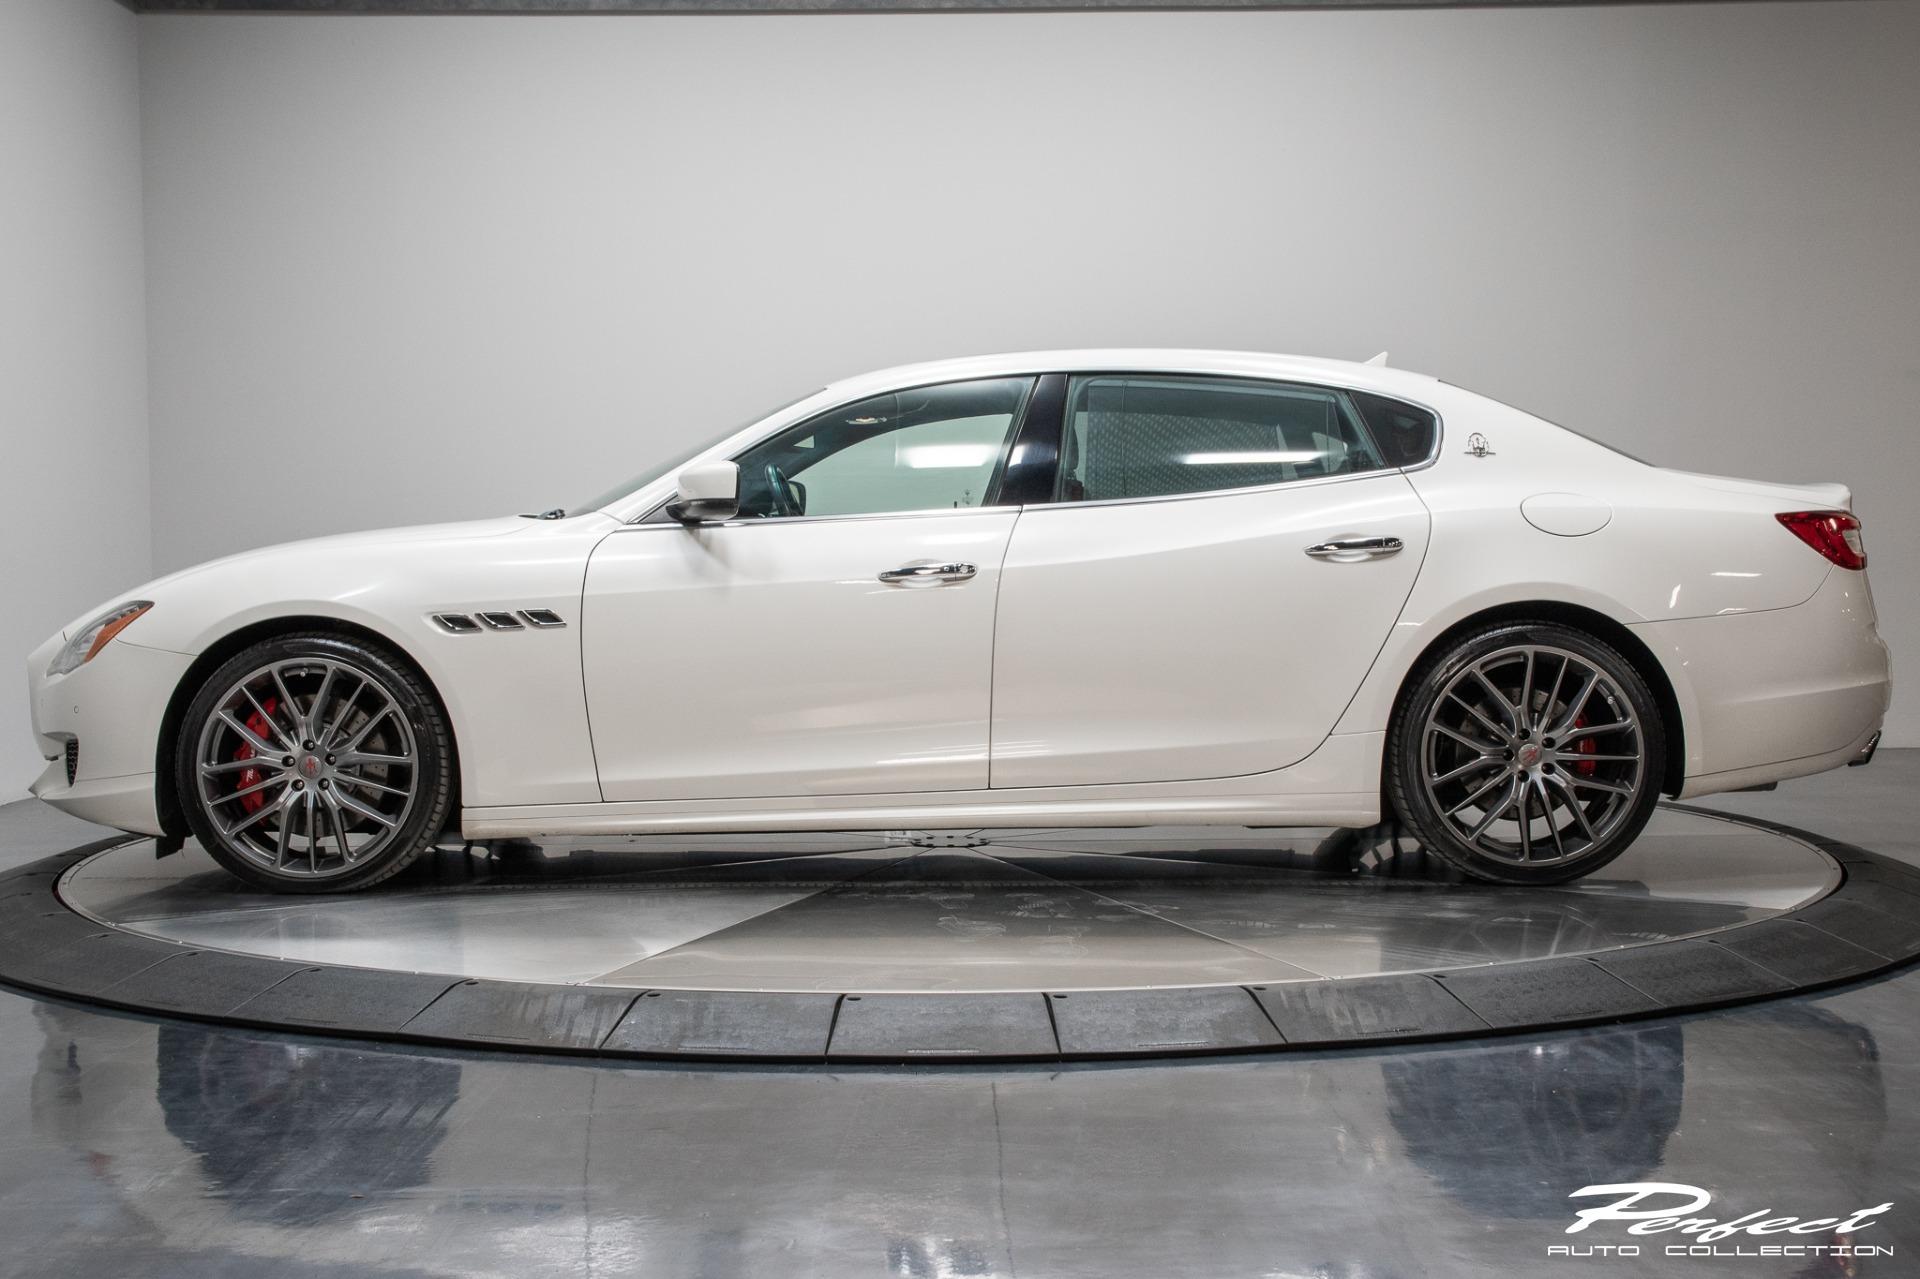 Used 2015 Maserati Quattroporte GTS